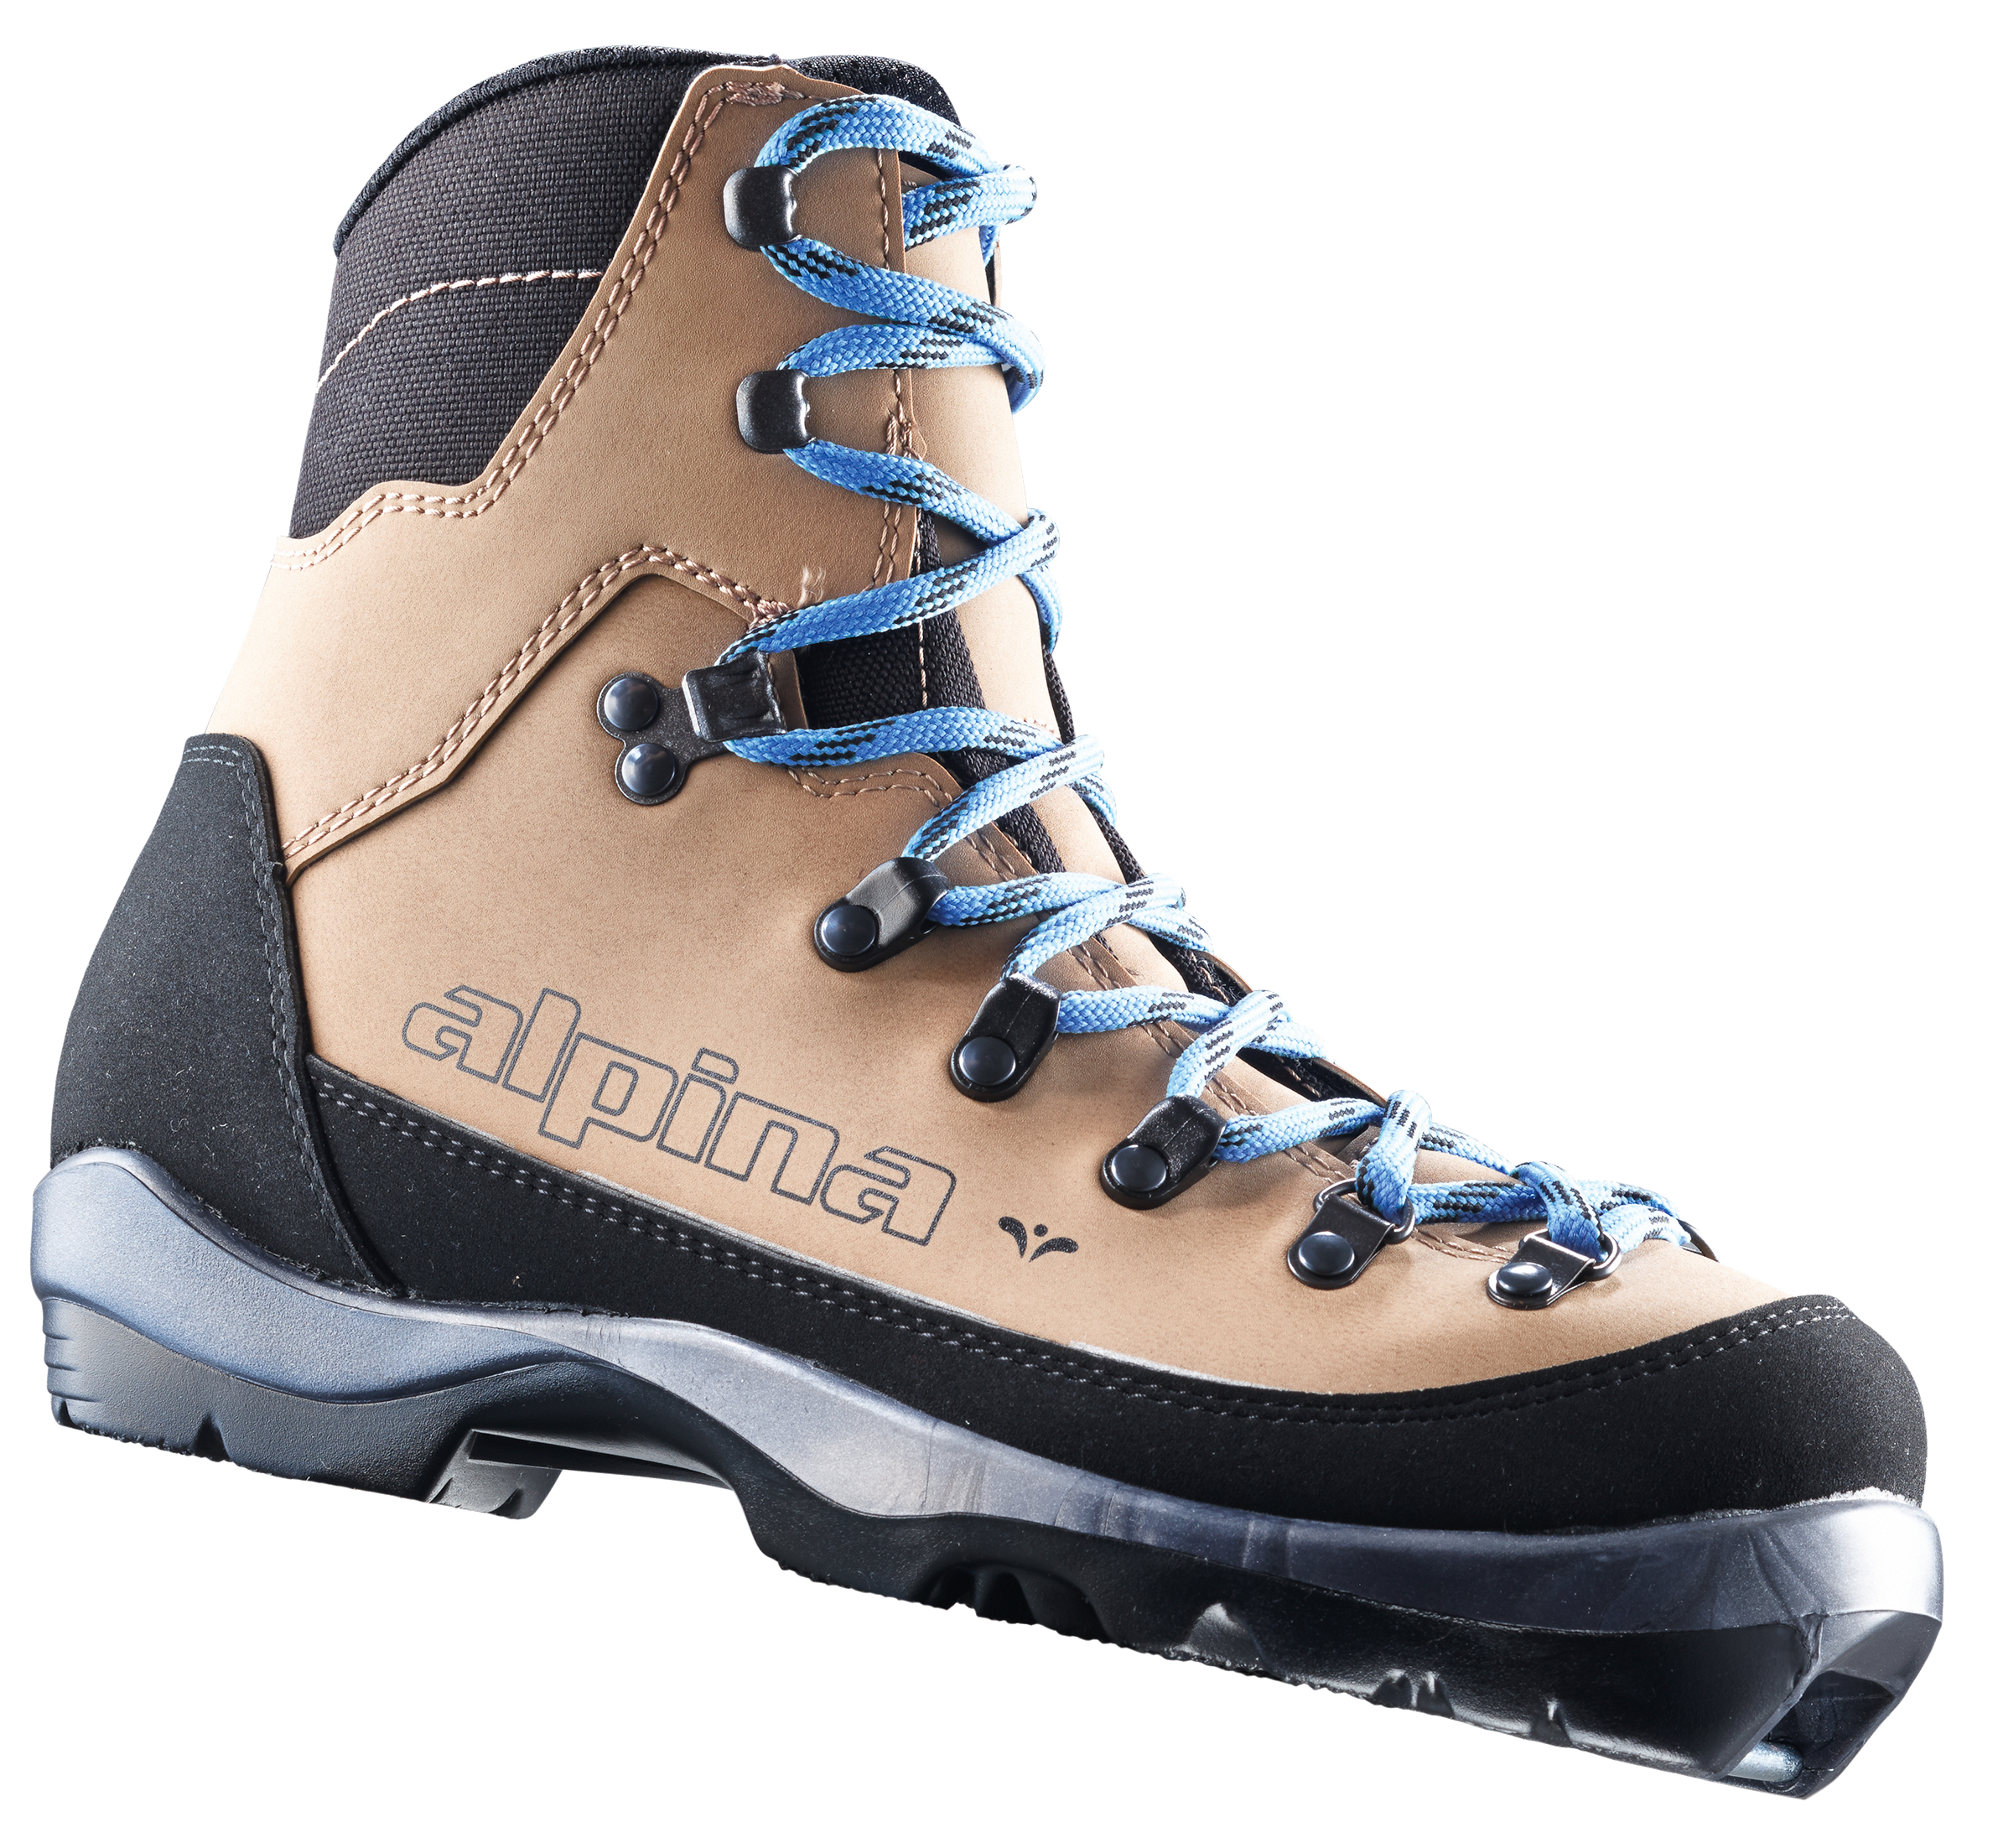 Alpina Montana Eve NNN BC Boots Womens - Alpina backcountry boots